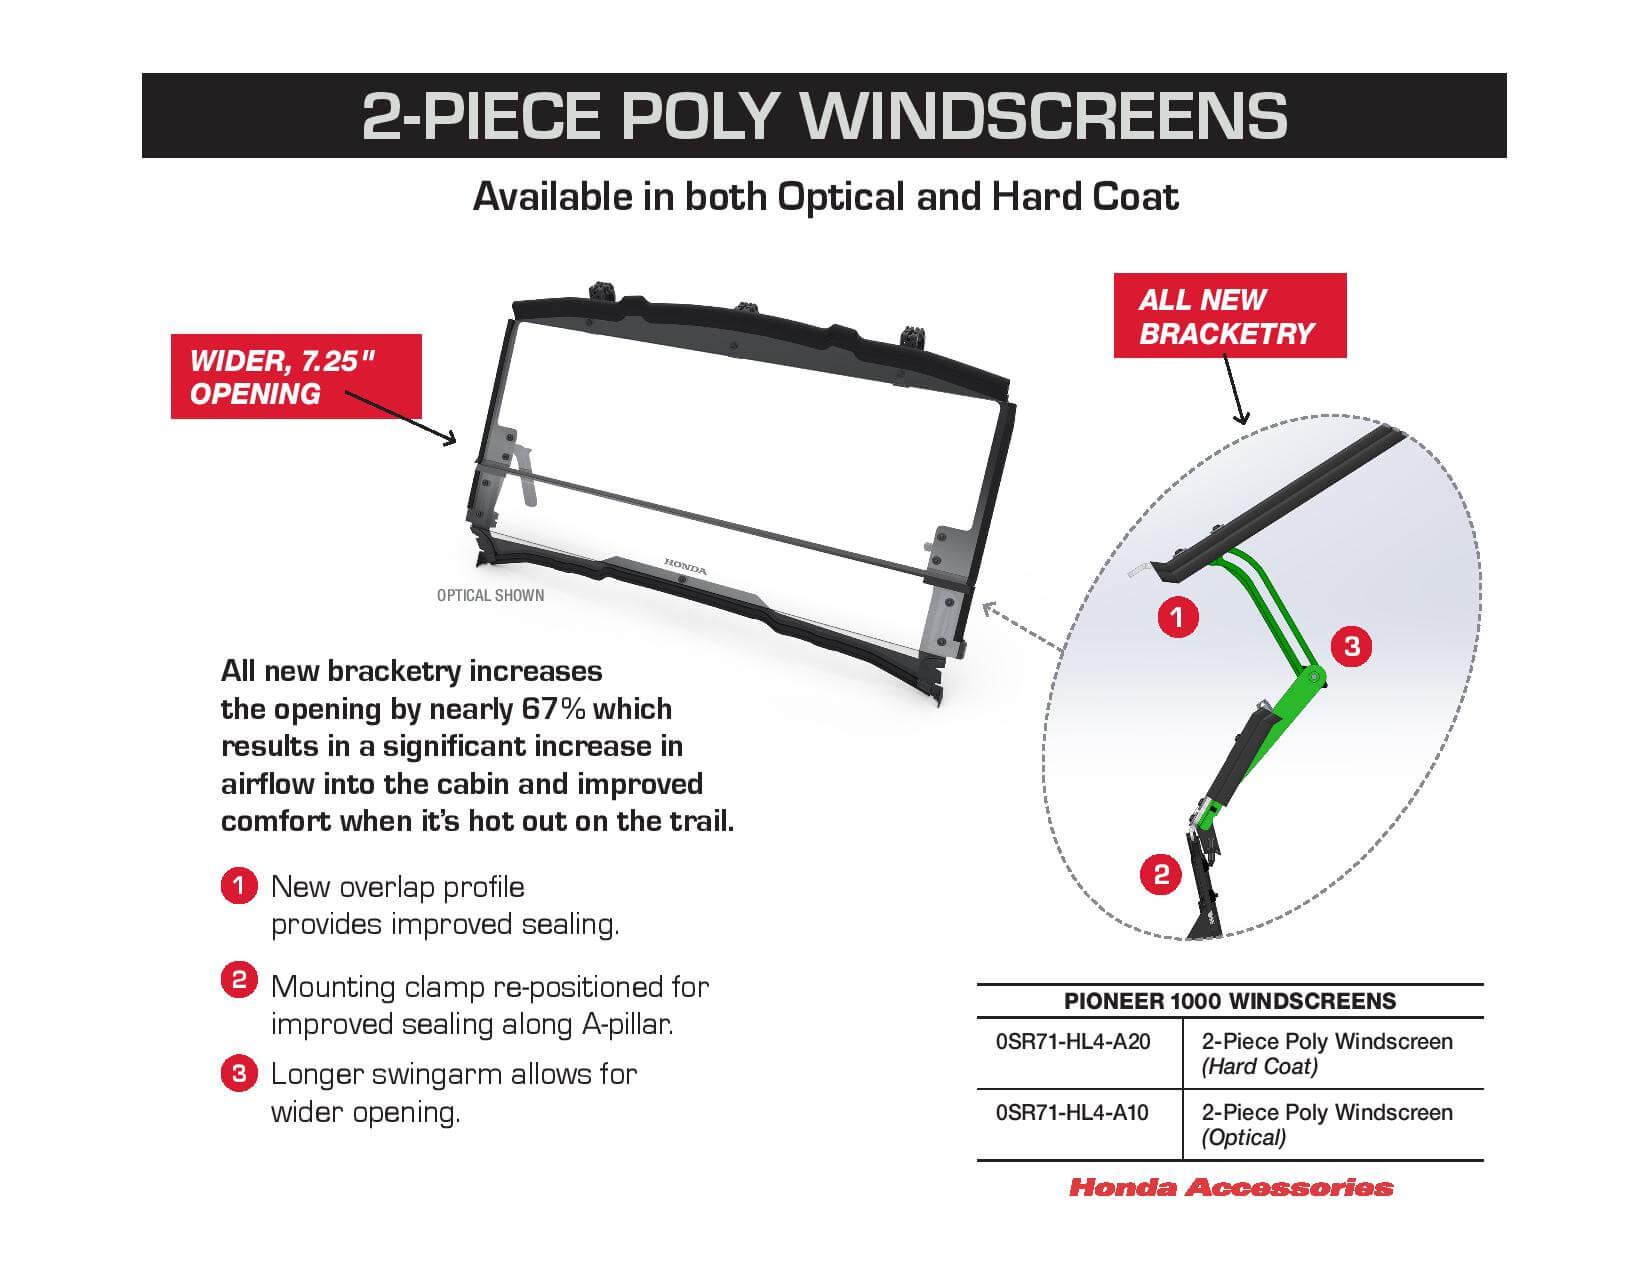 2021 Honda Pioneer 1000 2-piece windshield changes